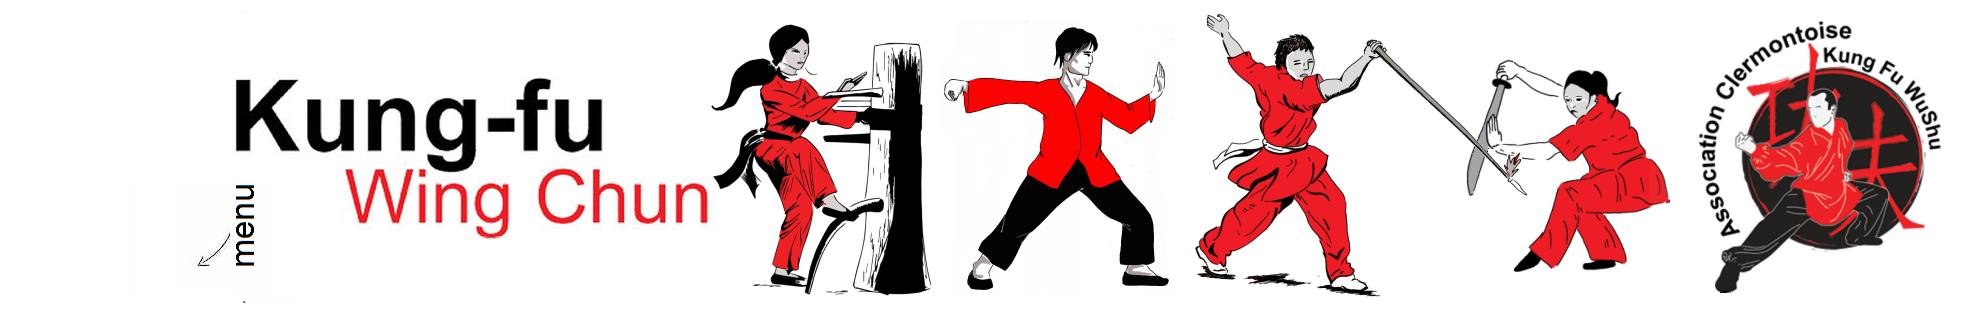 ACKFWS – Association Clermontoise de Kung Fu Wushu